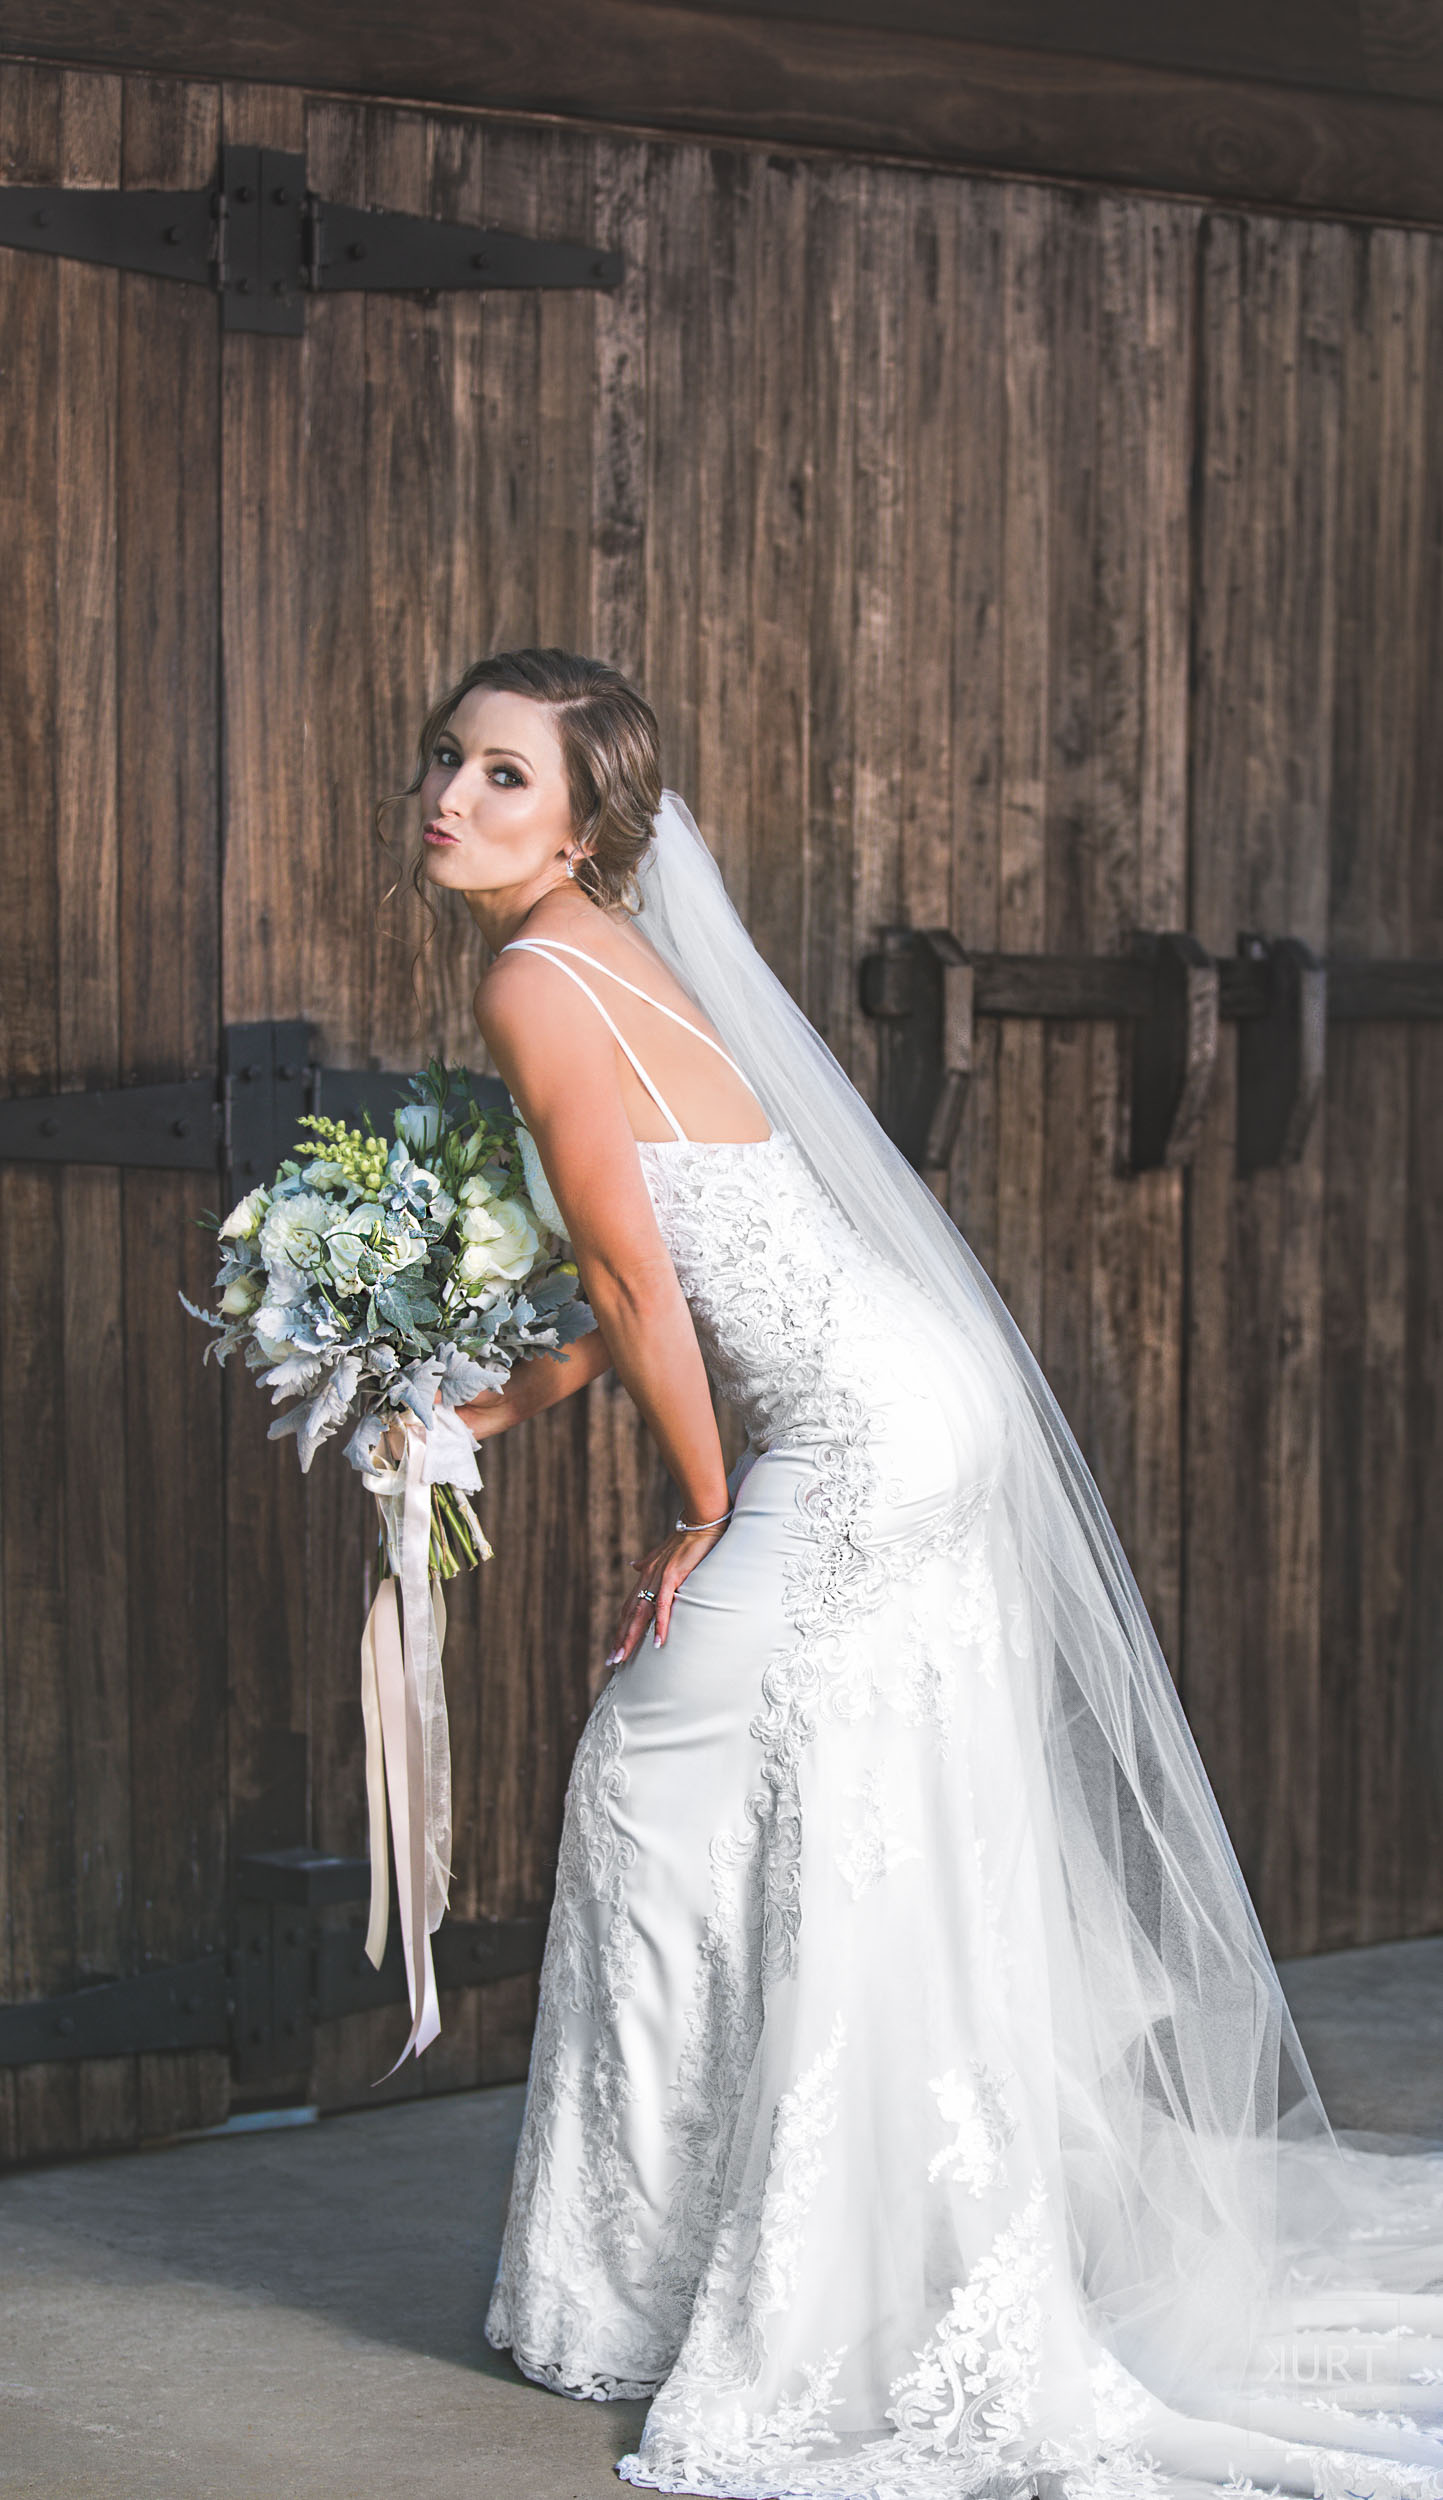 Bride portrait photography by Kurt Nigg